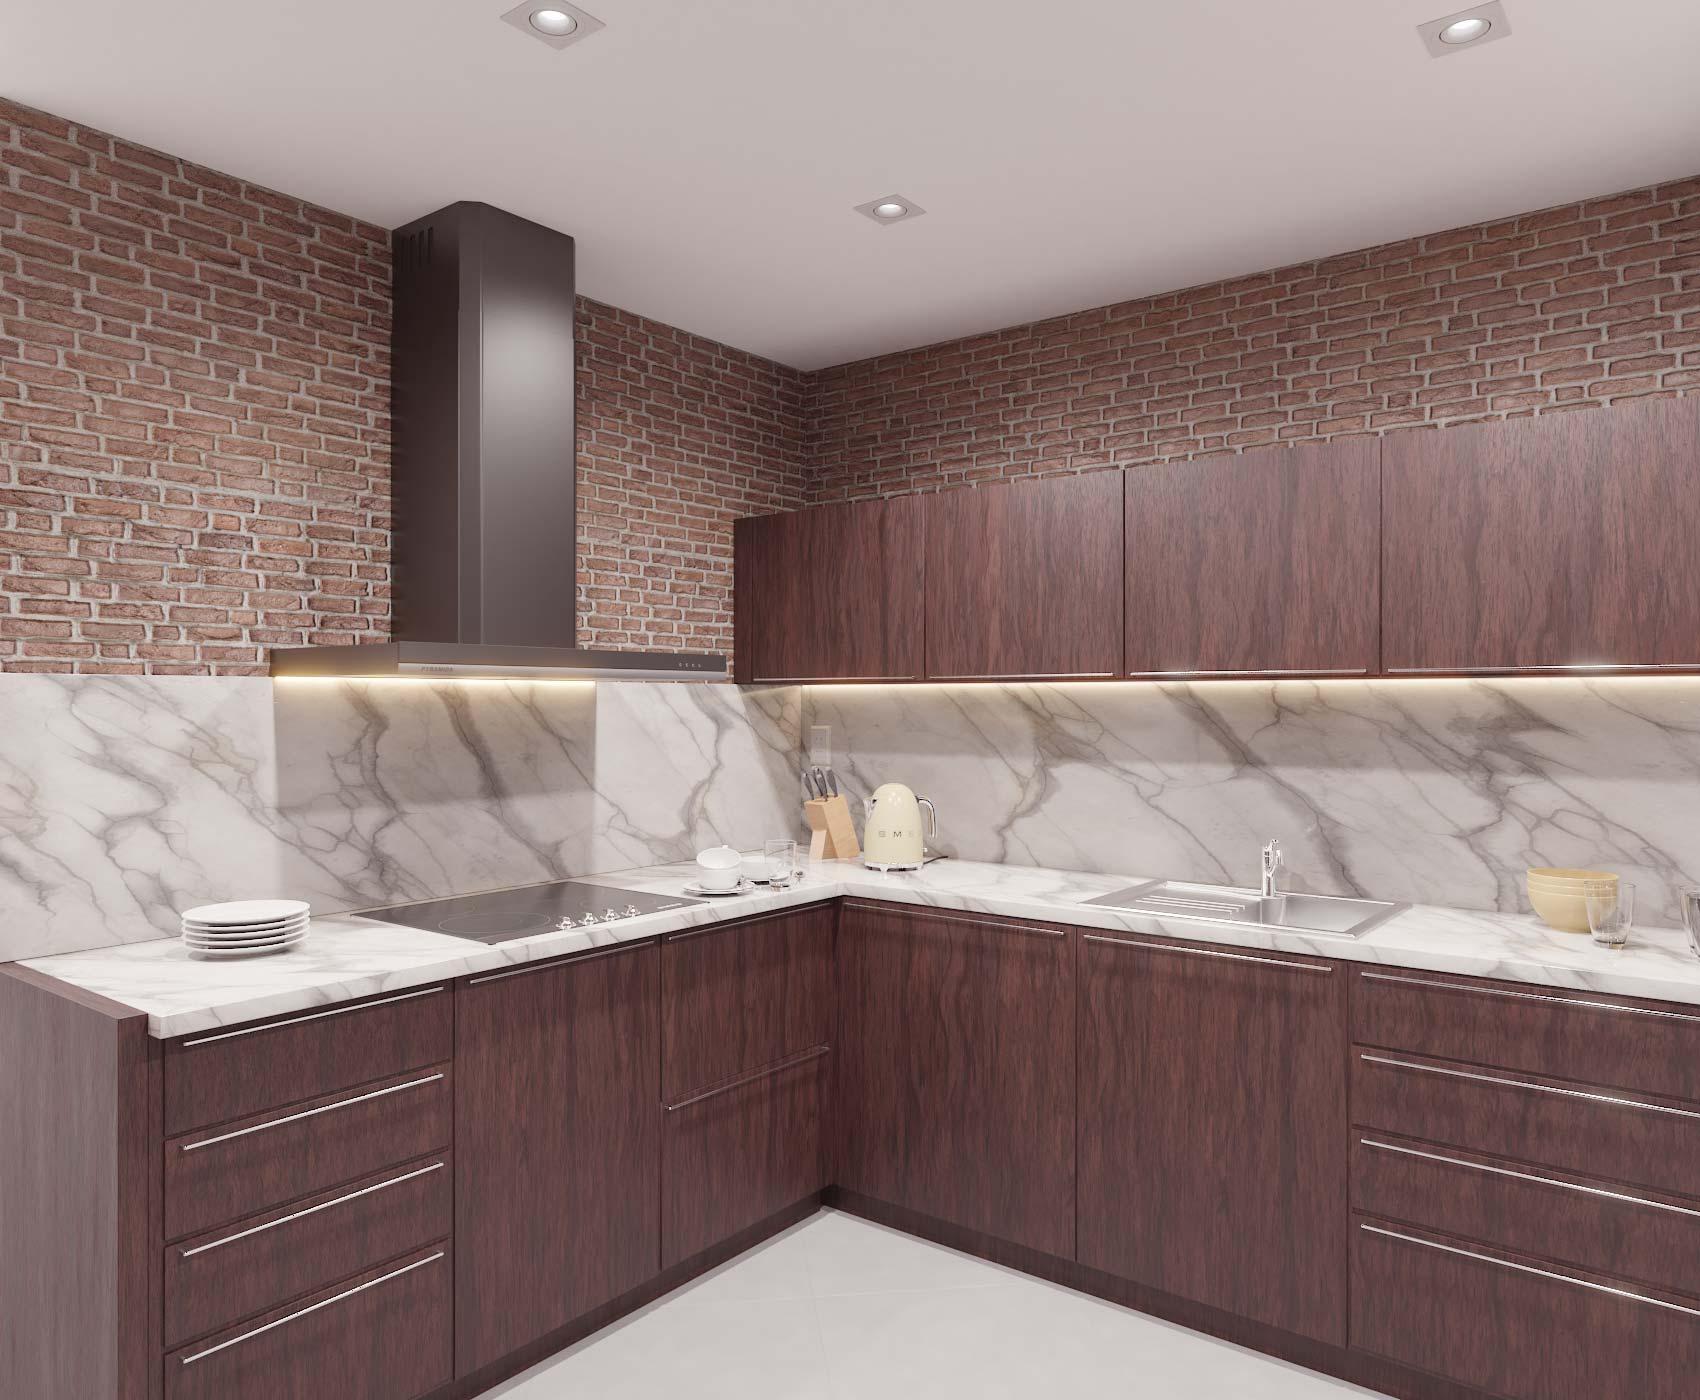 idea3d - vizualizácia kuchyňa 5